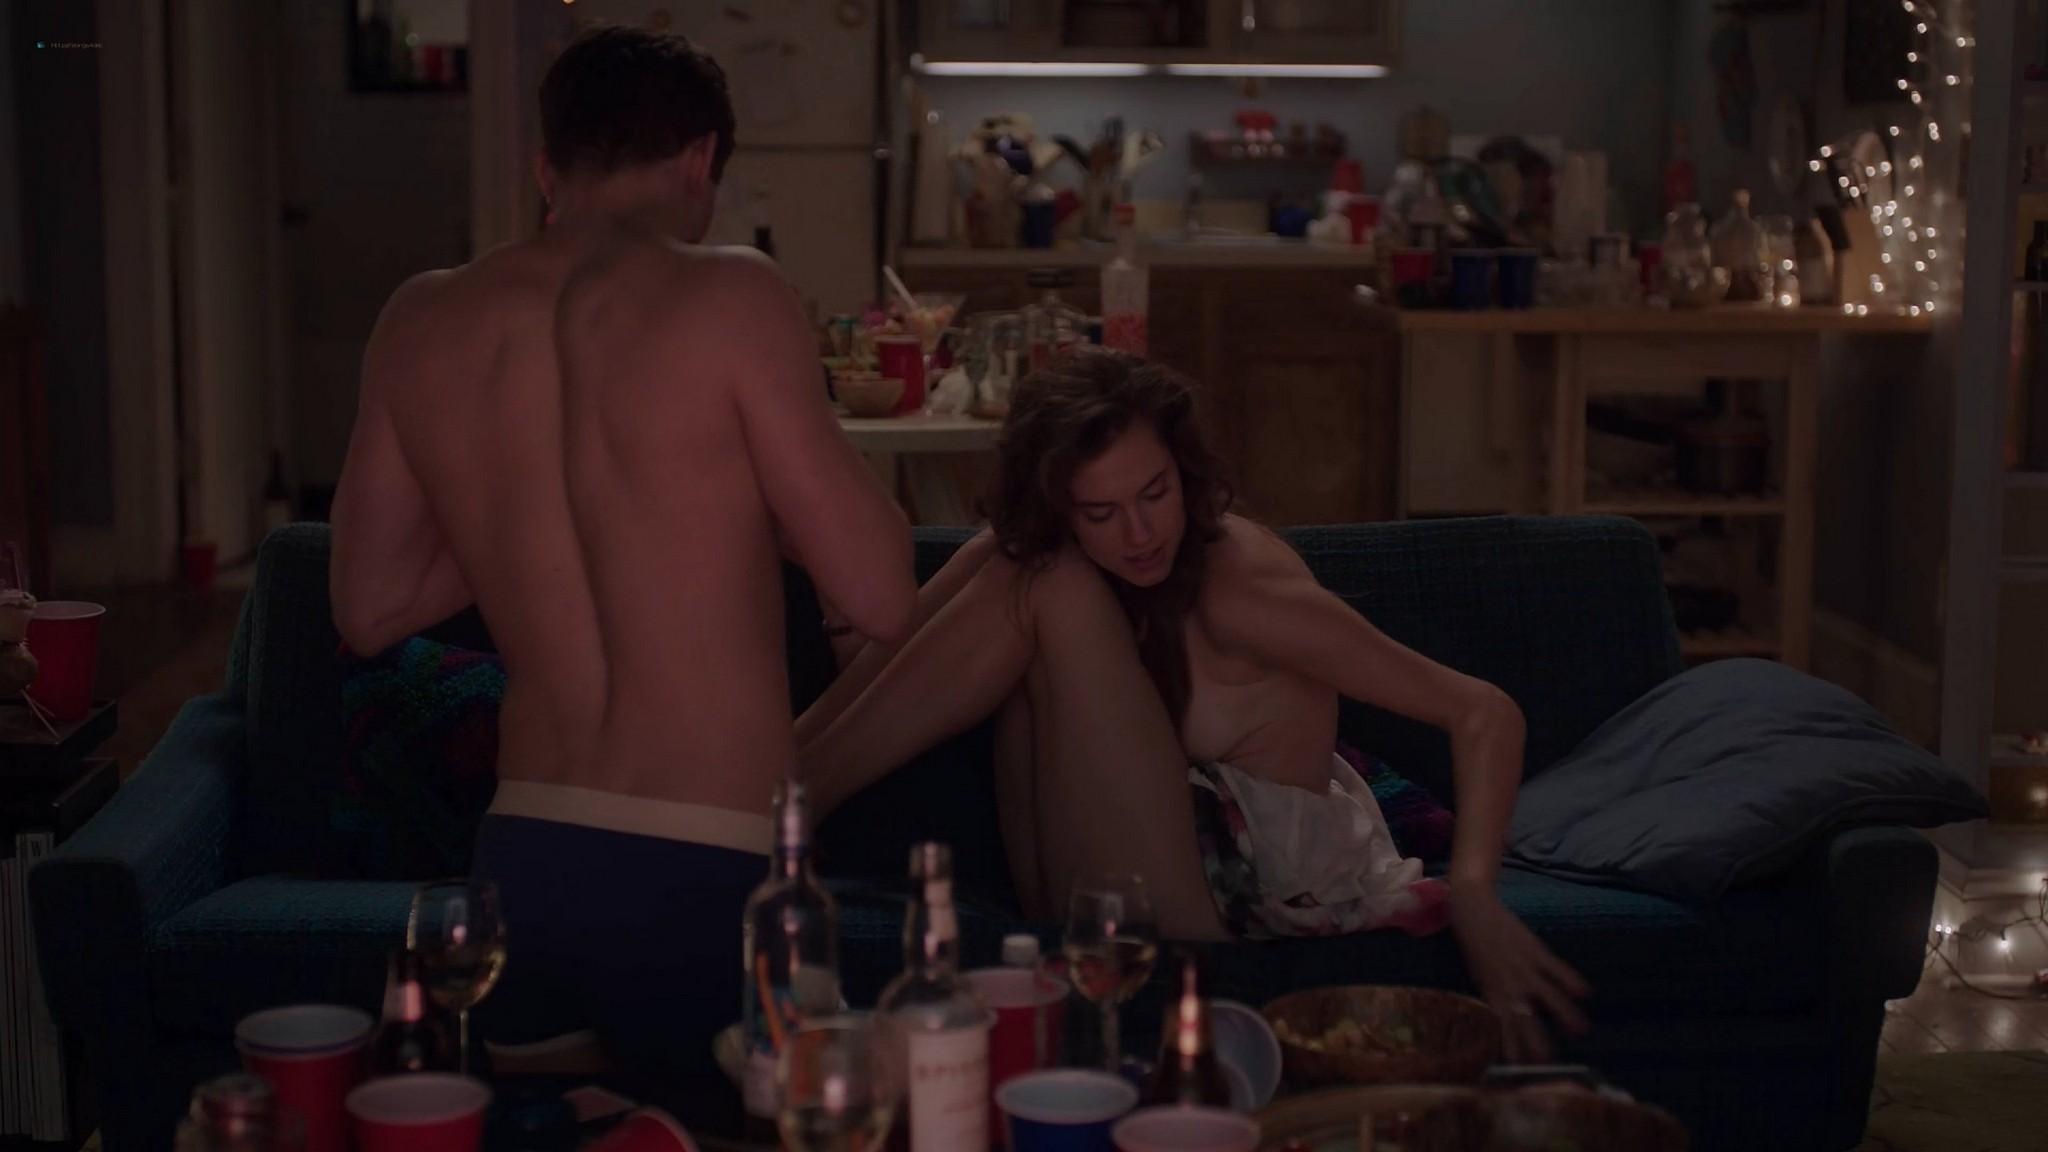 Allison Williams sex Lena Dunham nude Zosia Mamet hot Jemima Kirke nude Girls 2012 s2e1 5 1080p Web 3